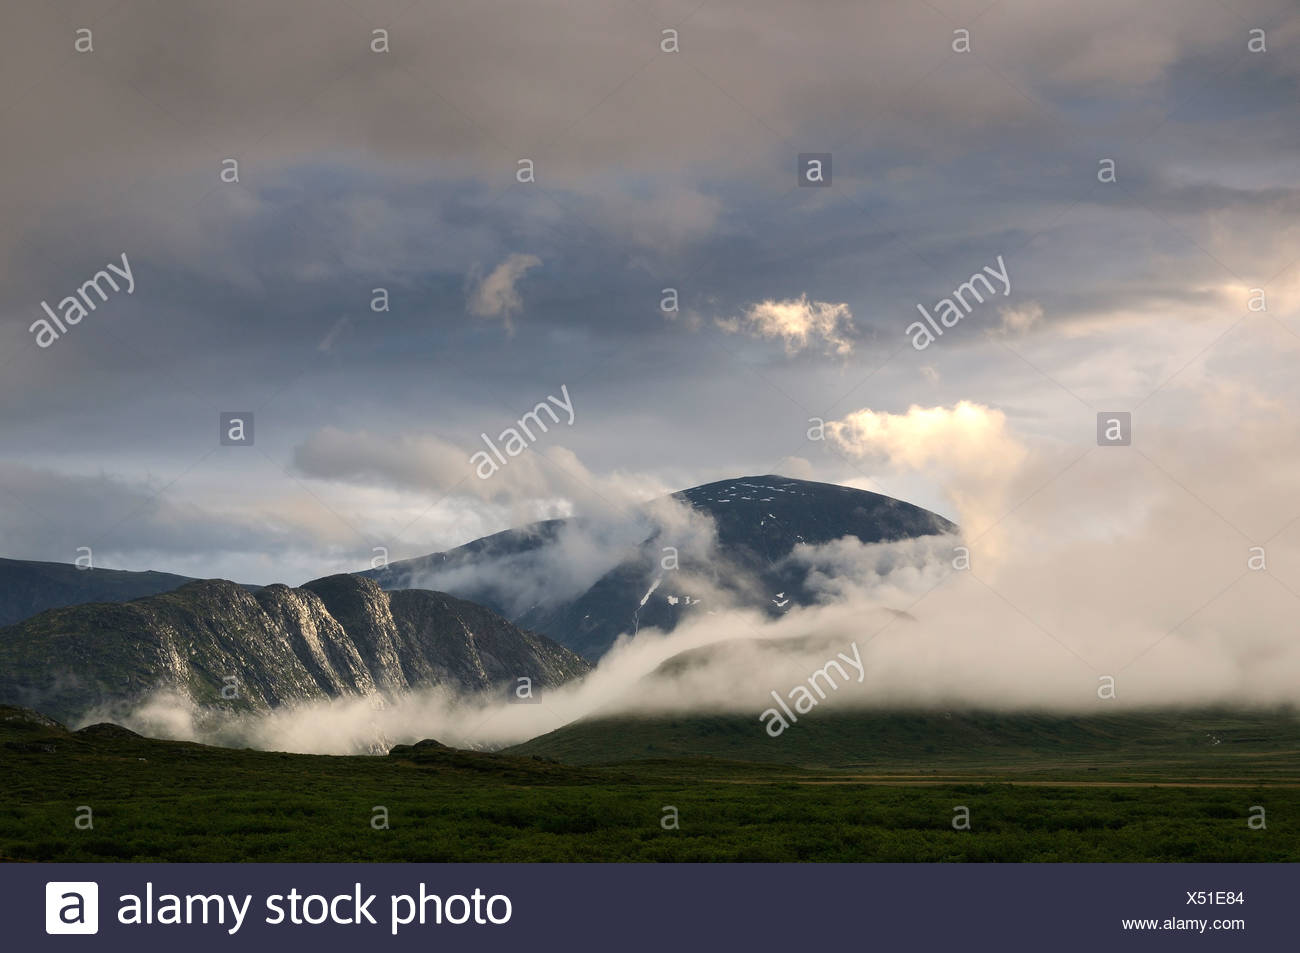 Mountain landscape in Jotunheimen National Park, Norway, Europe - Stock Image